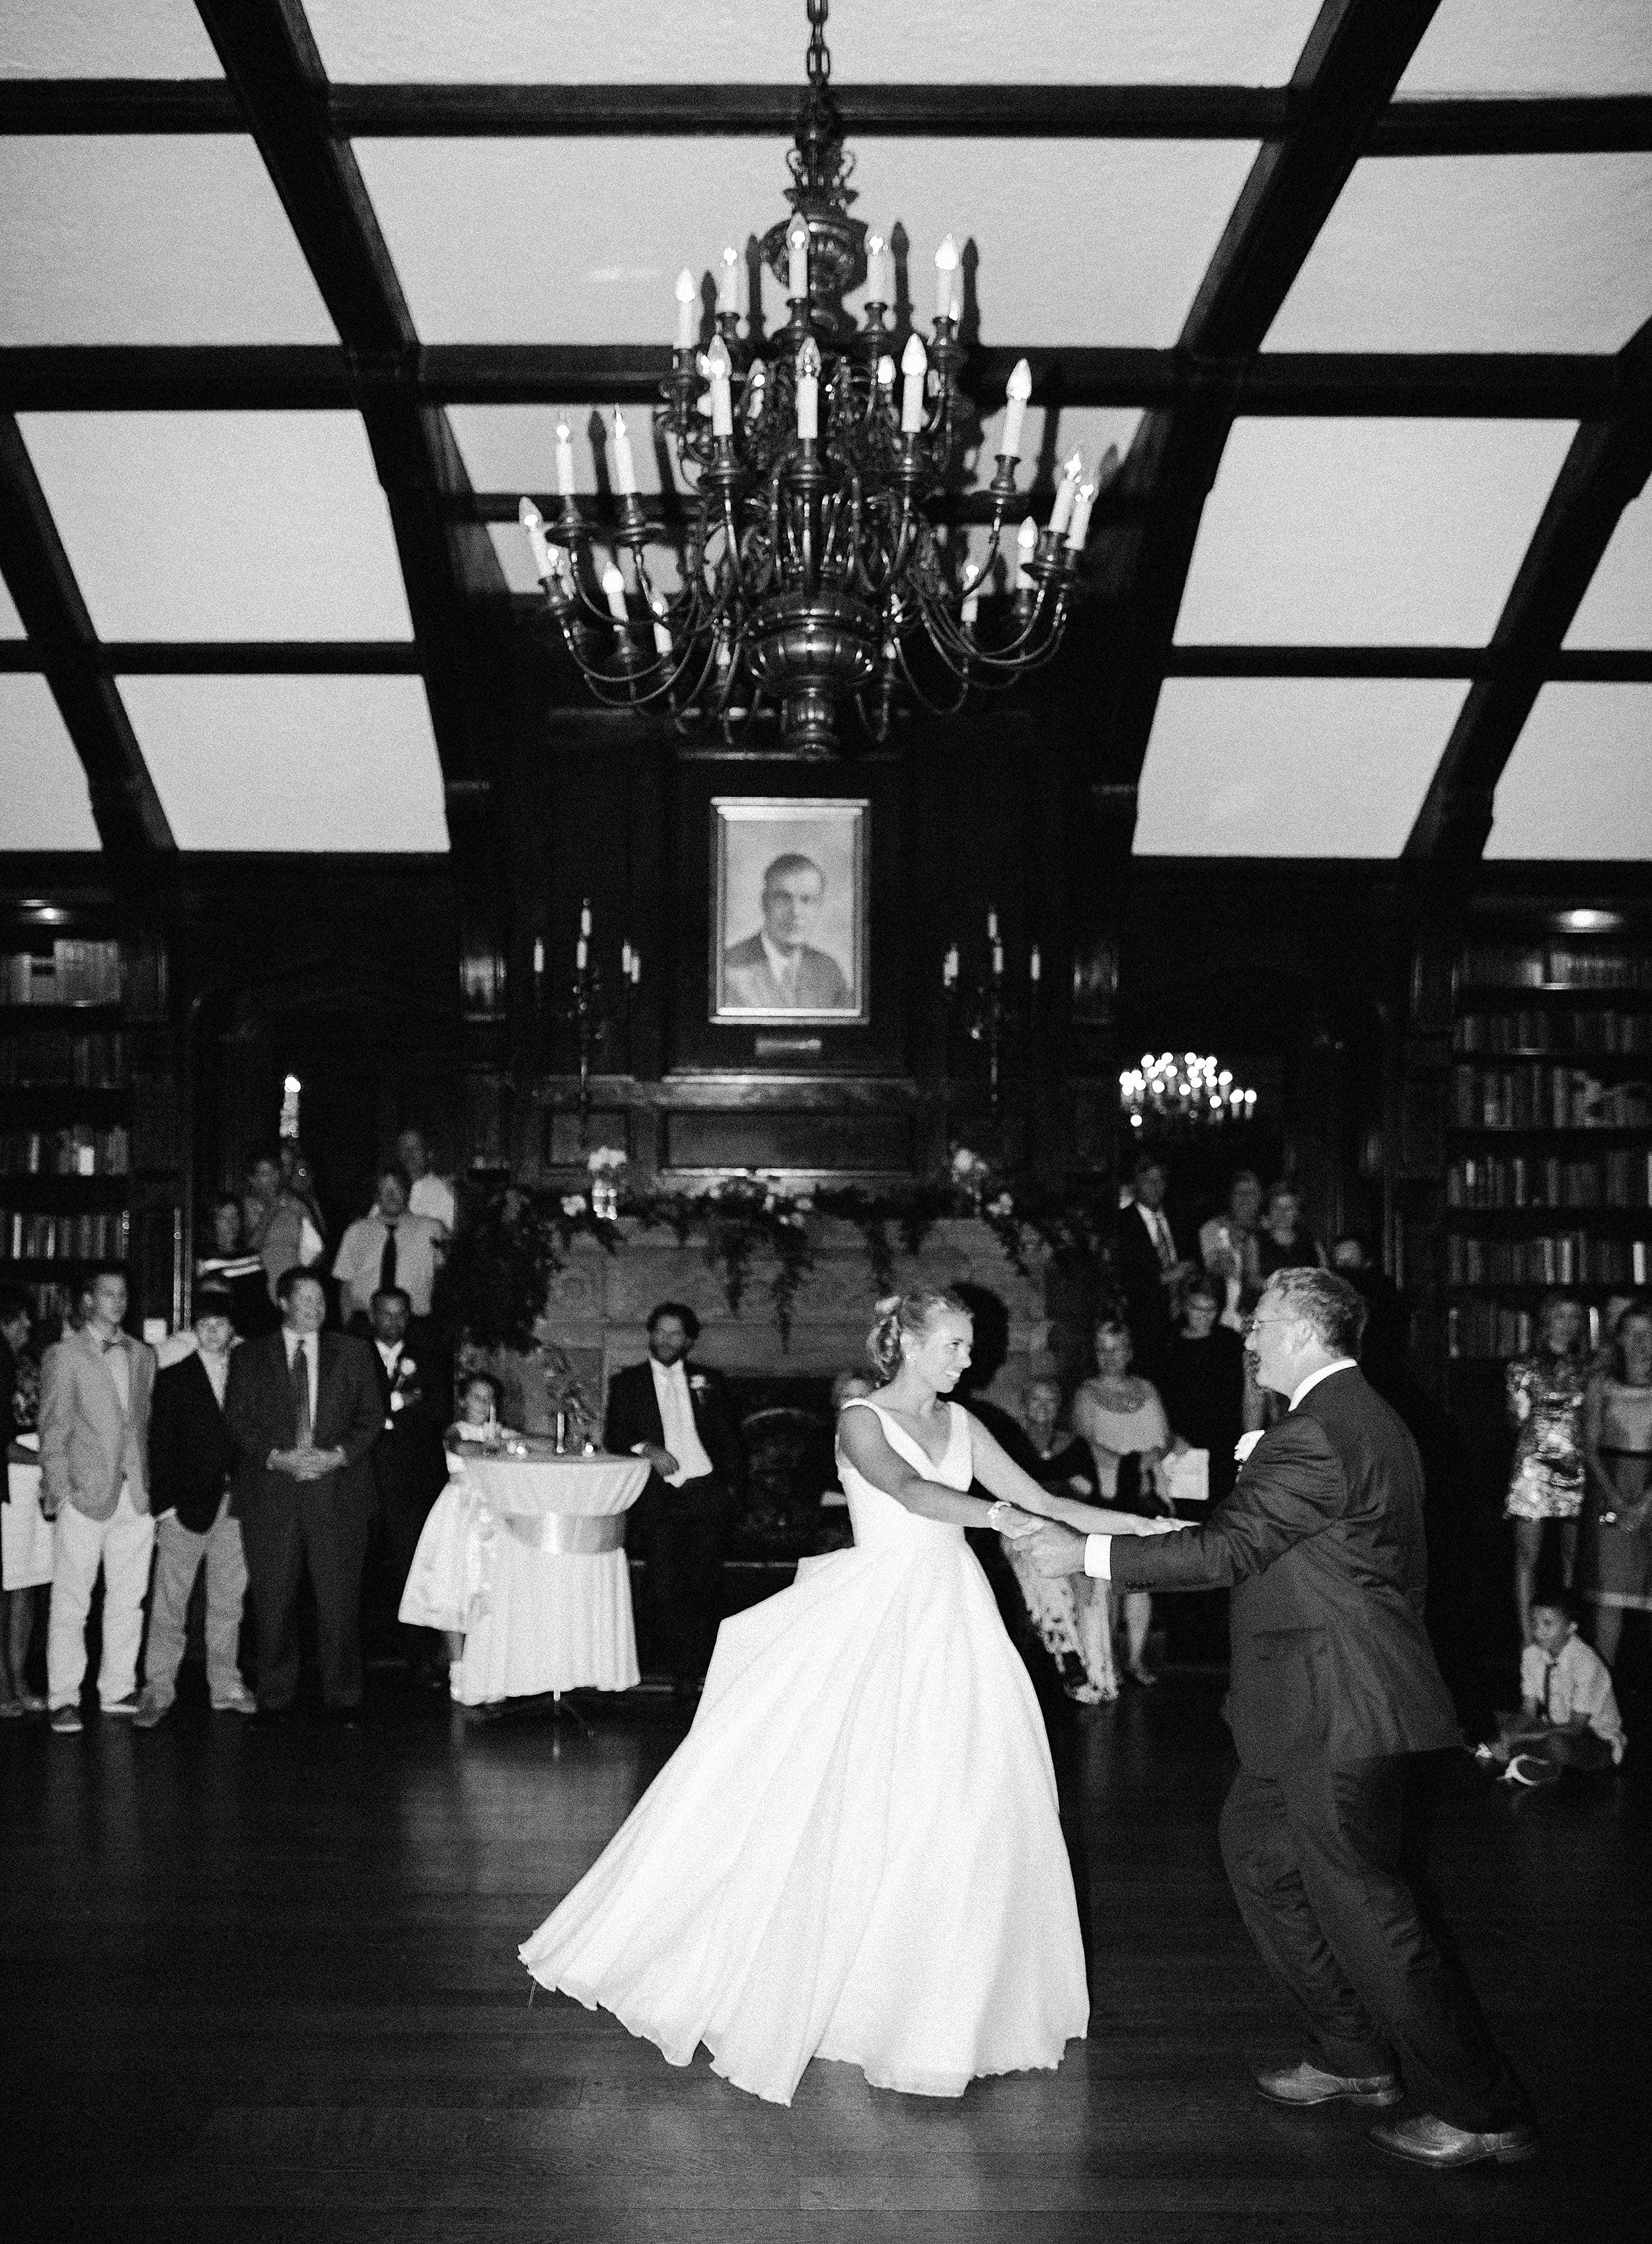 spindletop-lexington-wedding-photographer-039.JPG